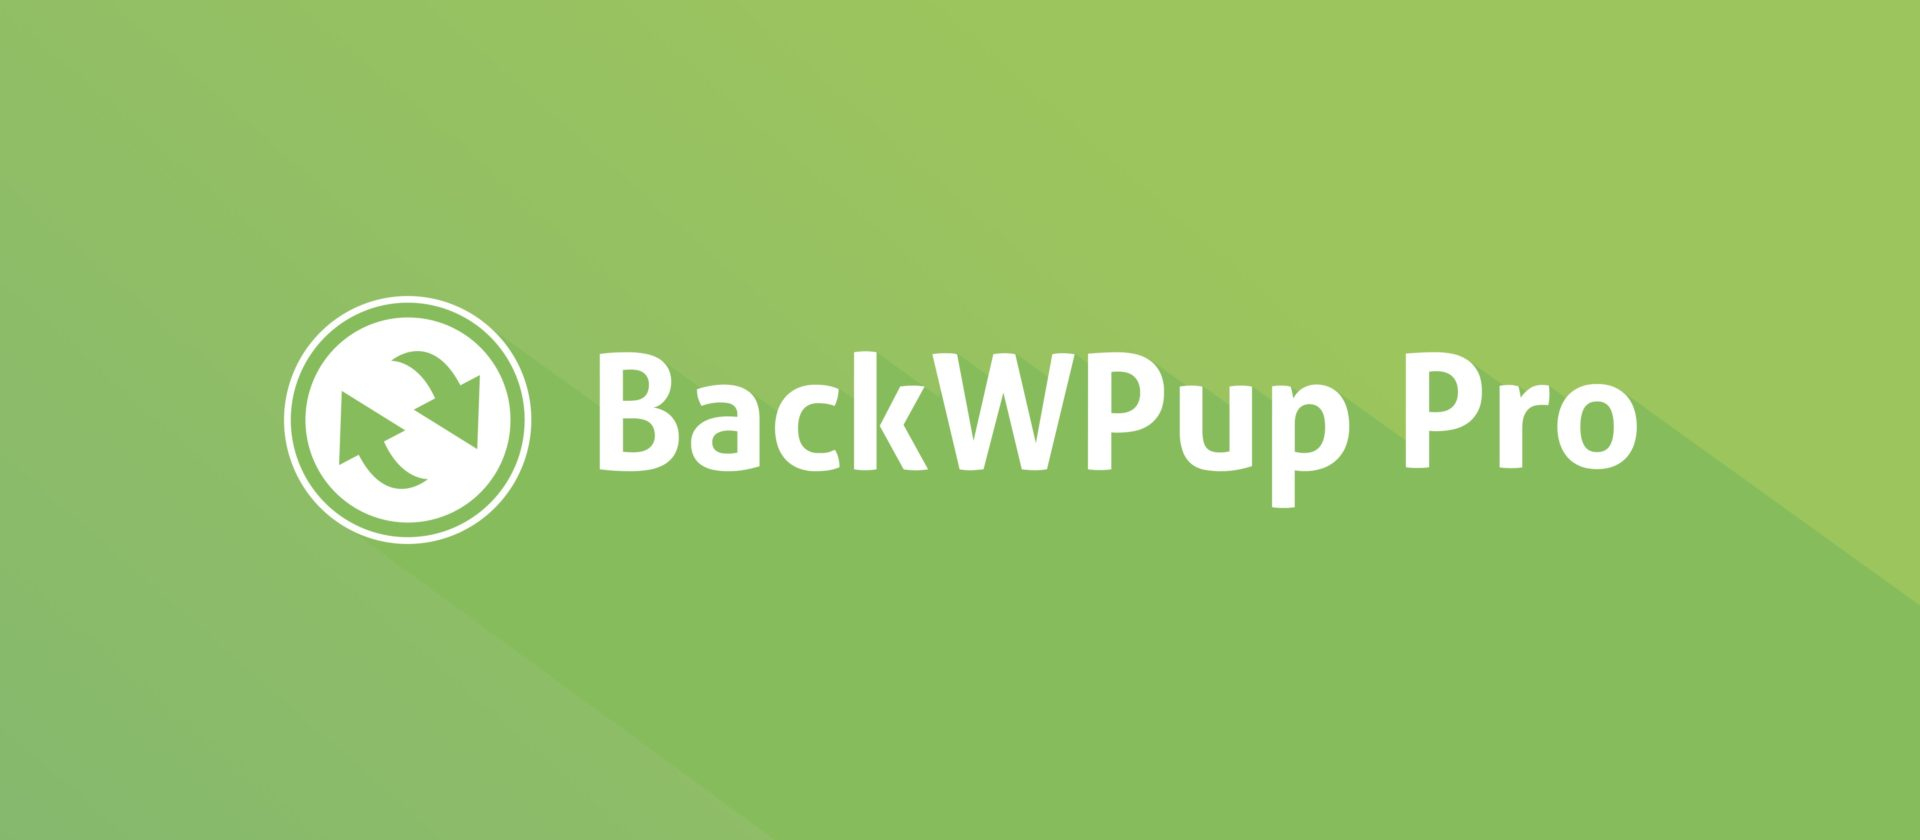 BackWPup Pro Supreme Discount: Welcome BackWPup Supreme!